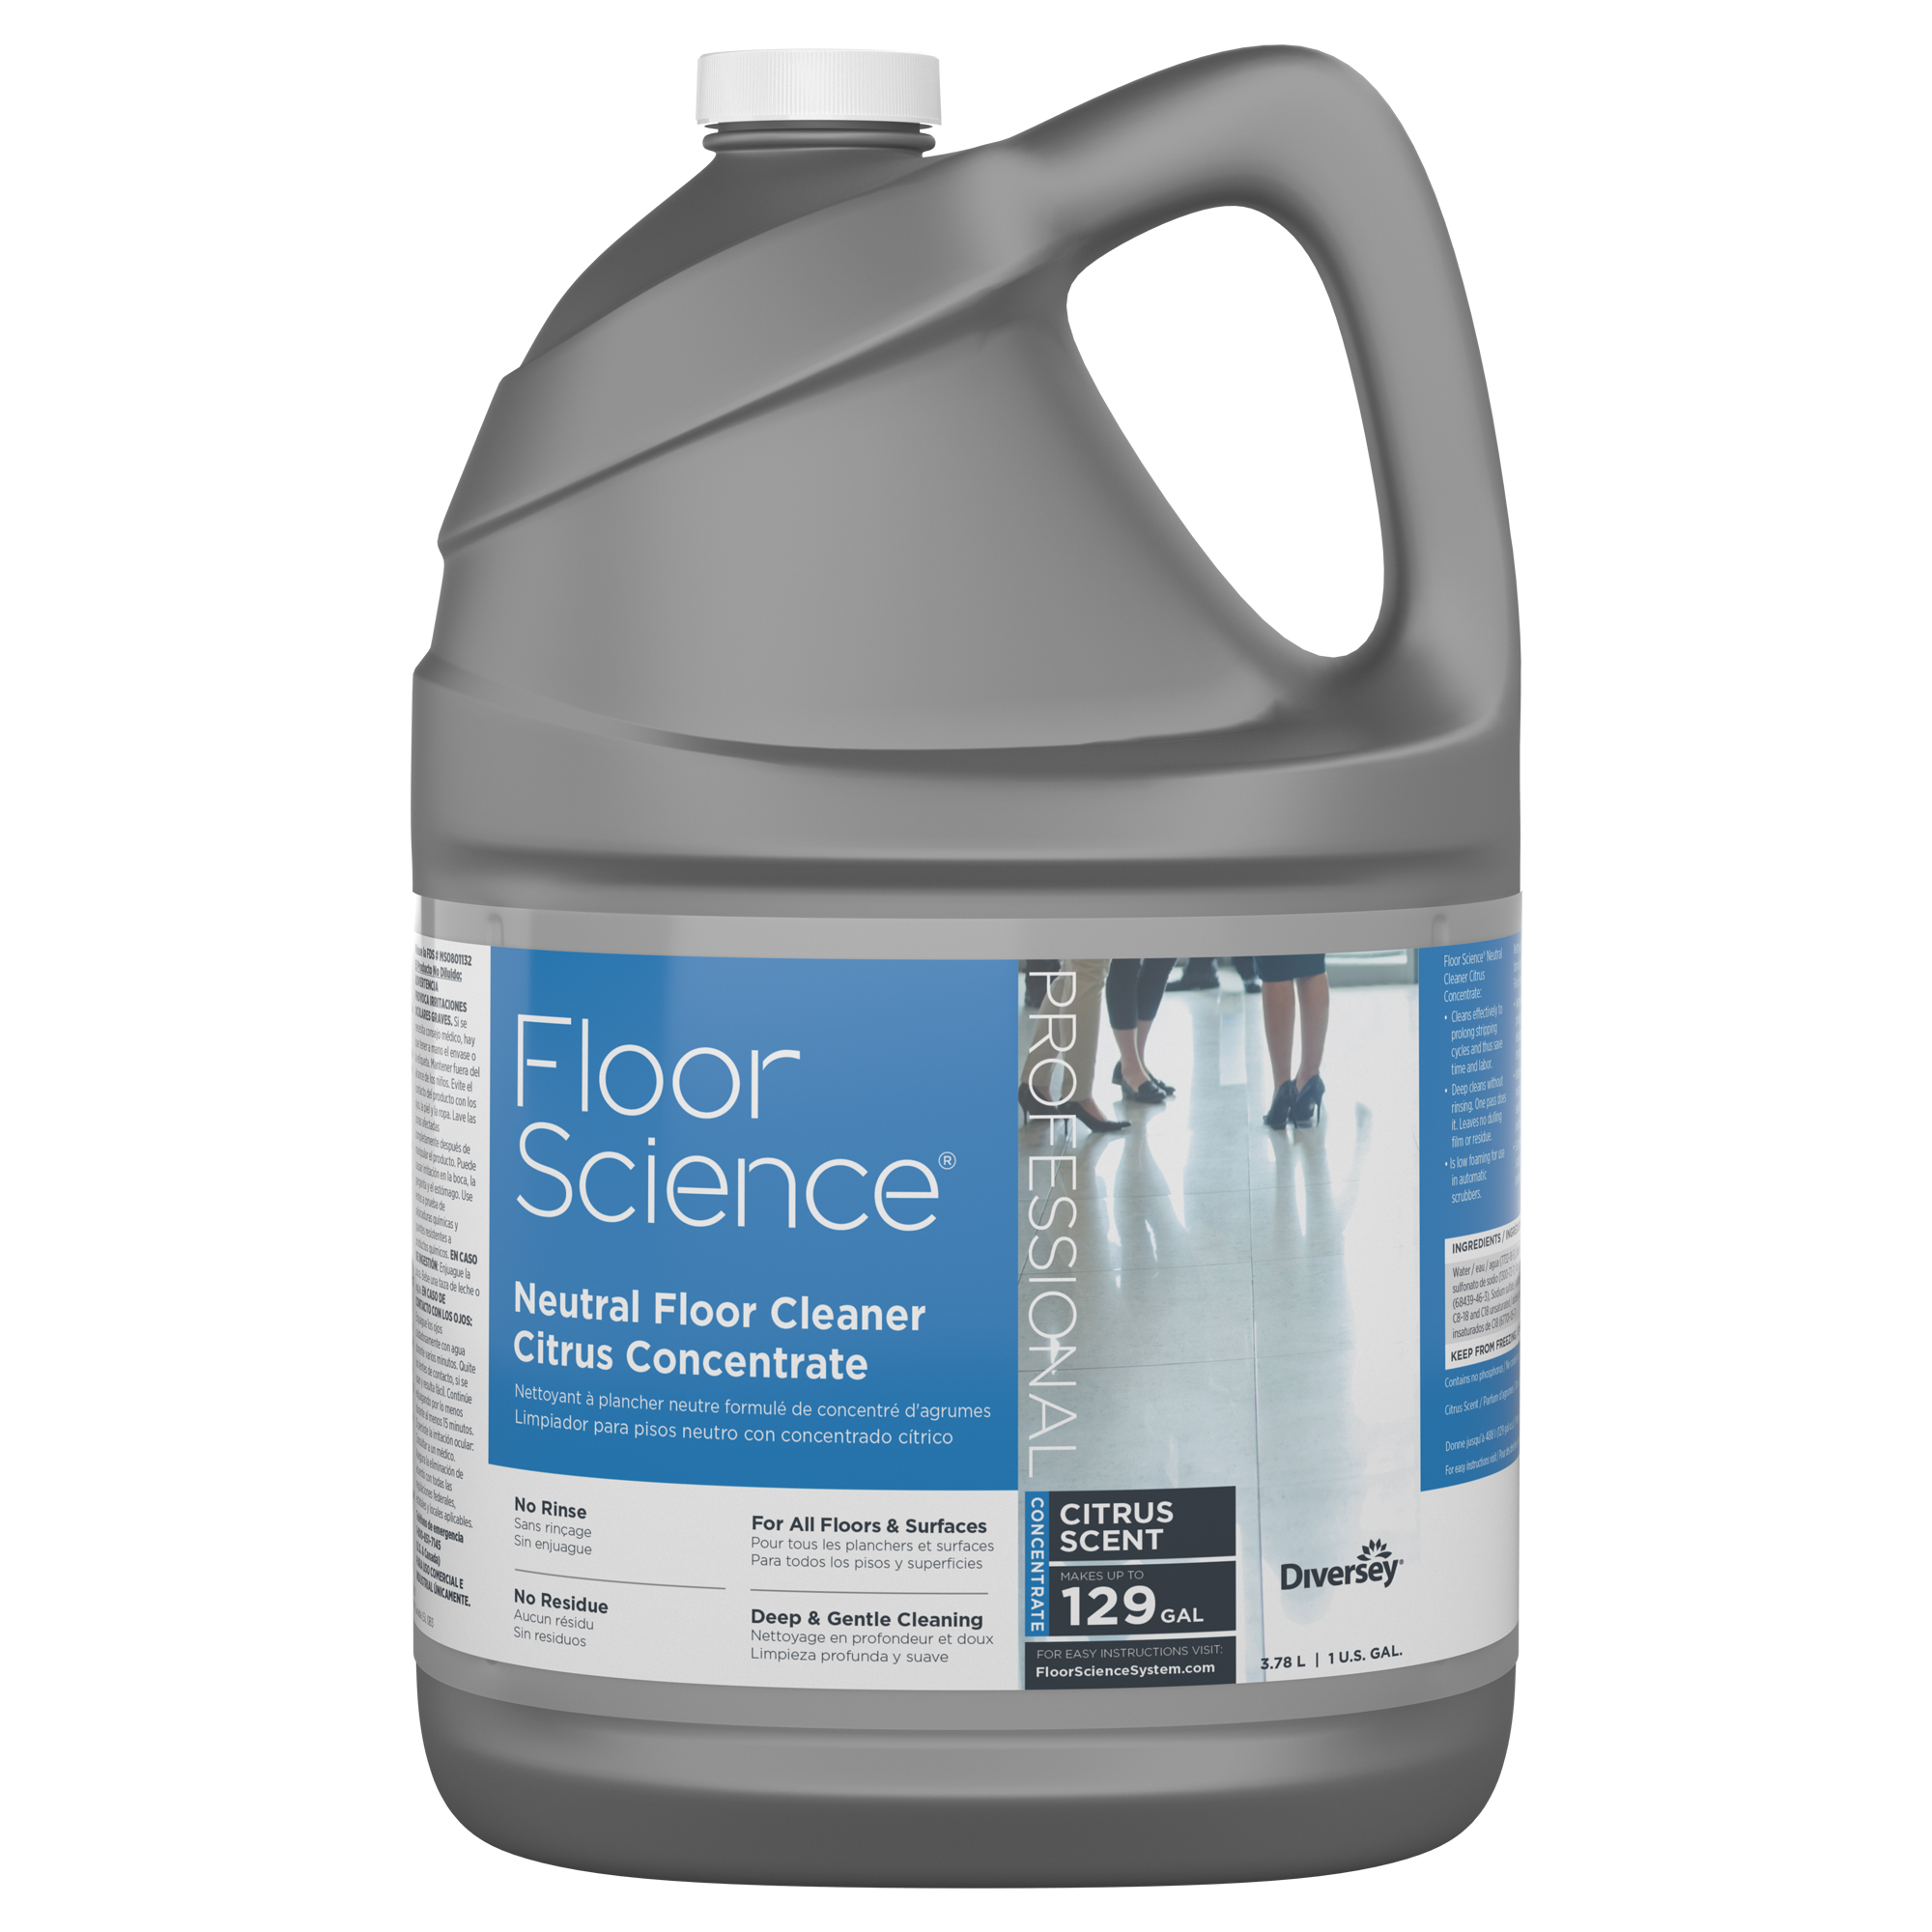 Floorscience Floor Science 174 Neutral Floor Cleaner Citrus